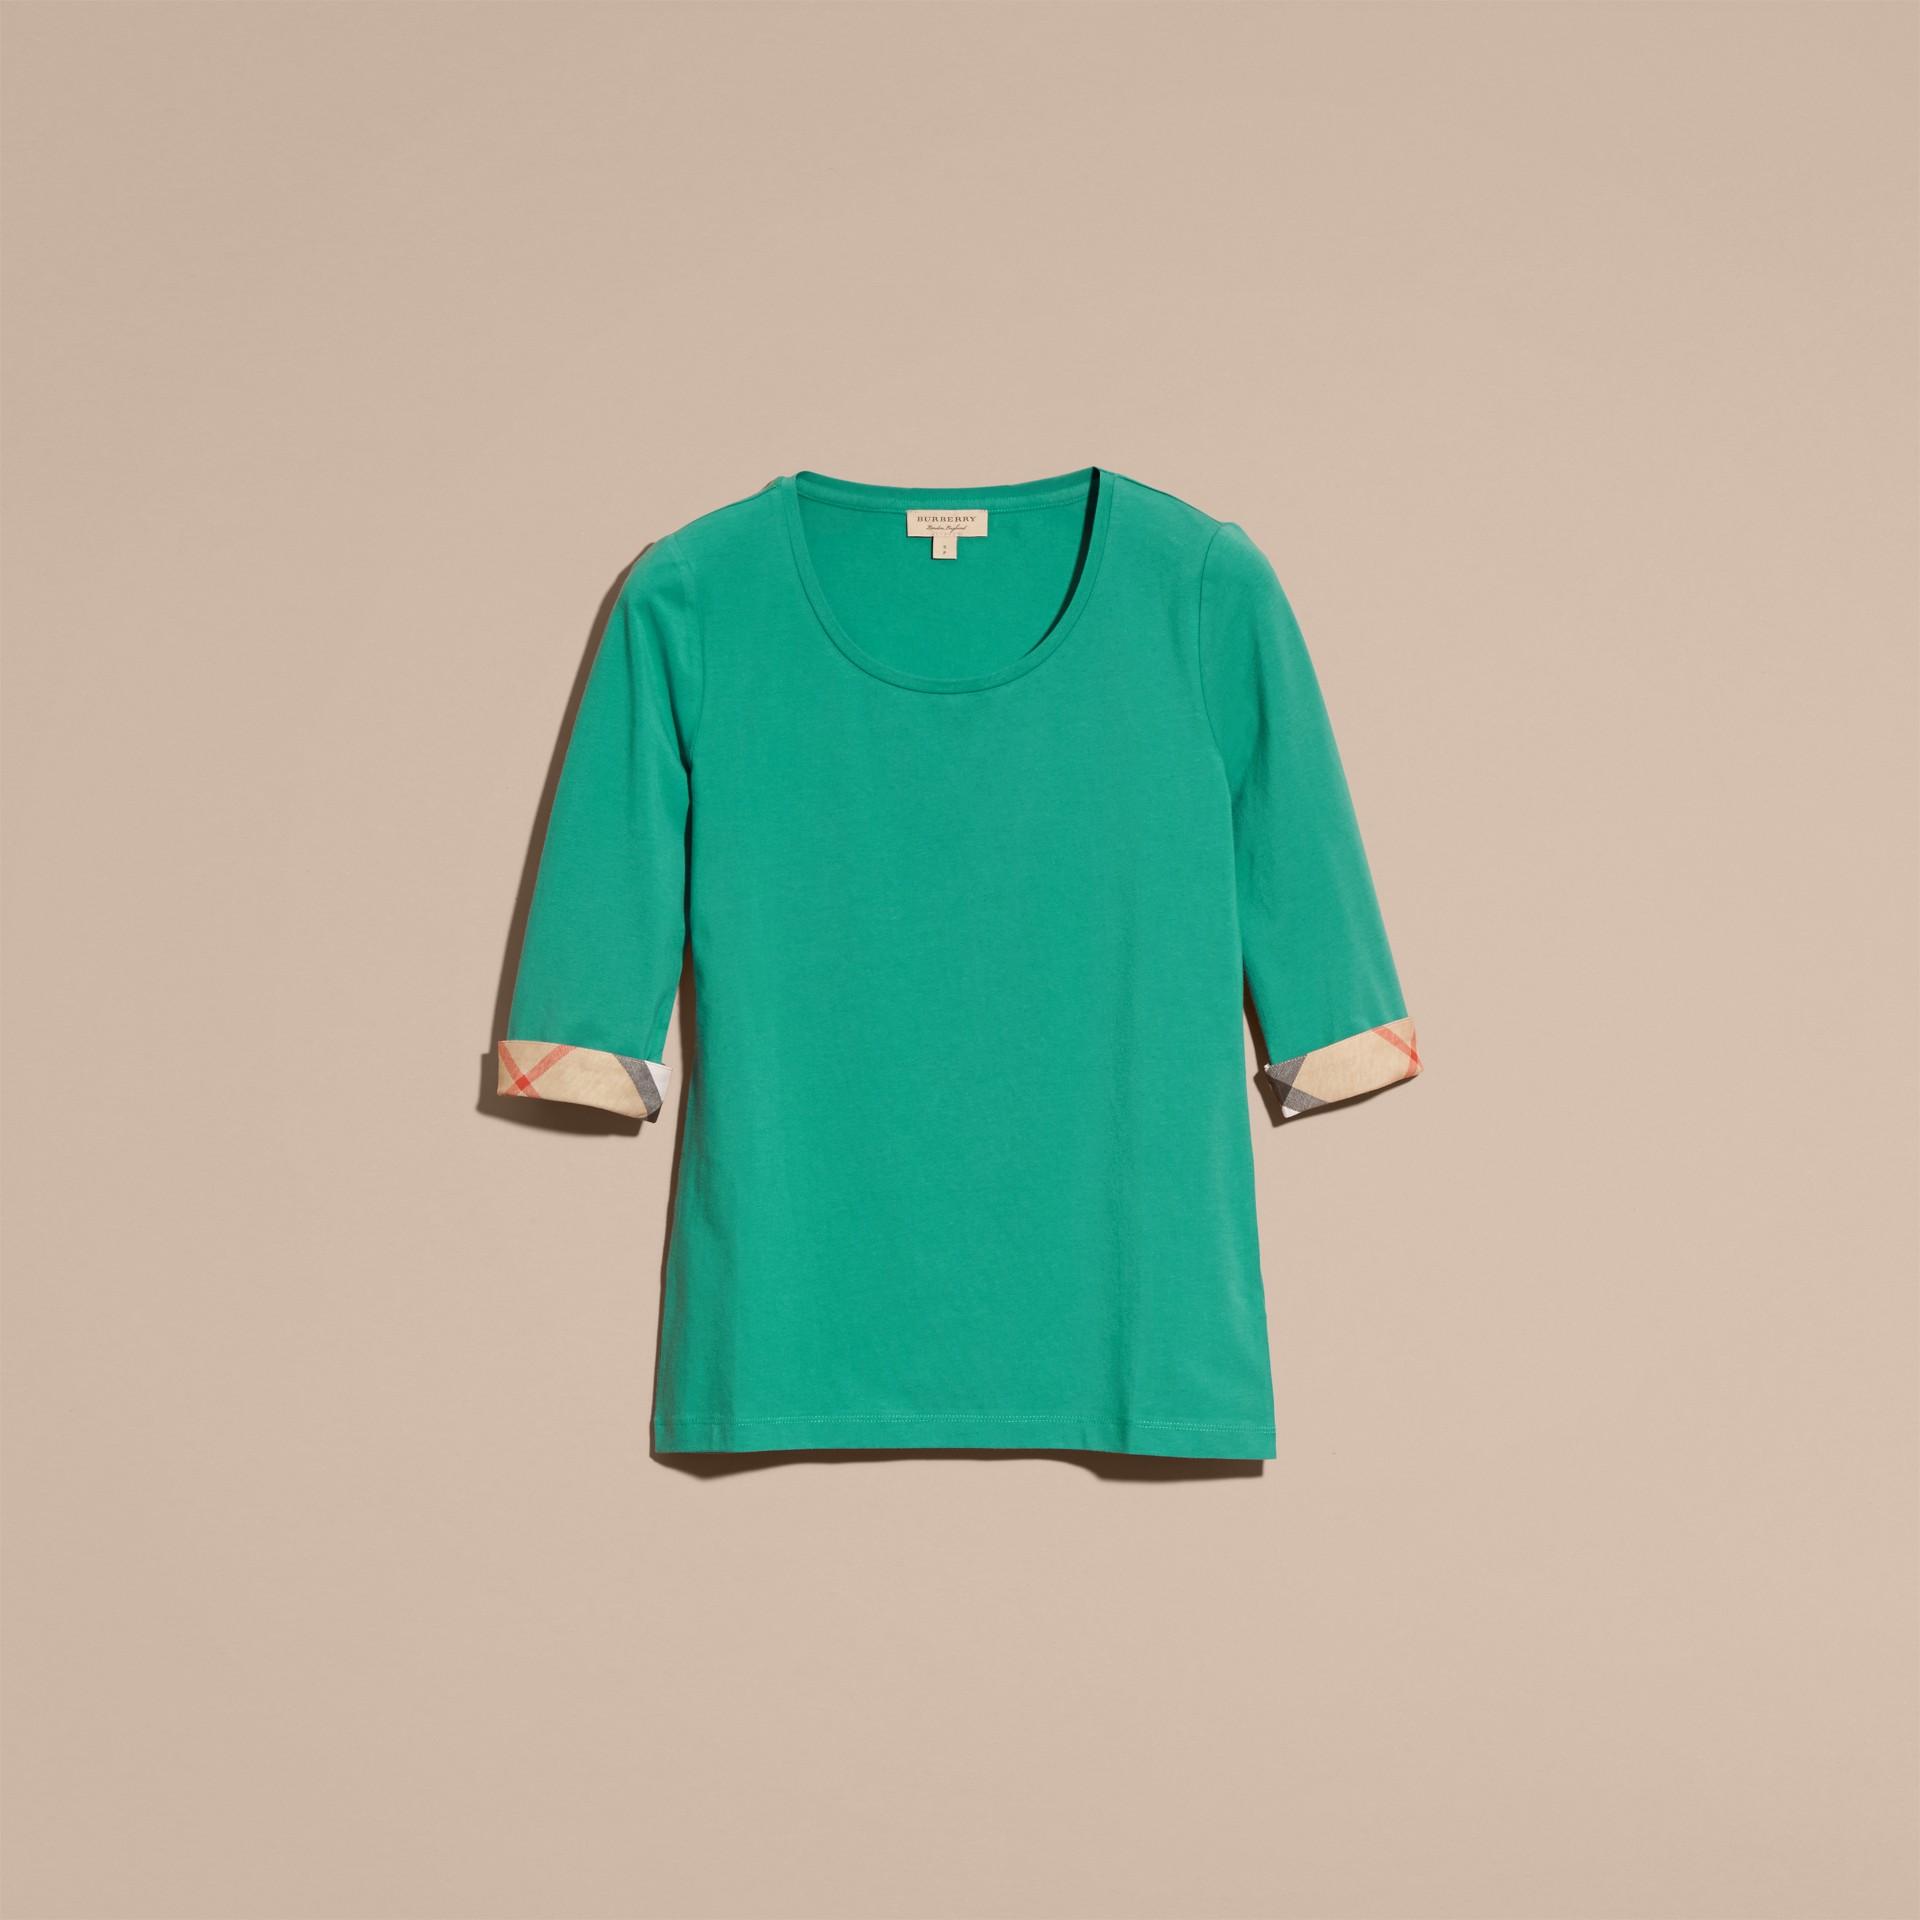 Aqua green Check Cuff Stretch-Cotton Top Aqua Green - gallery image 4